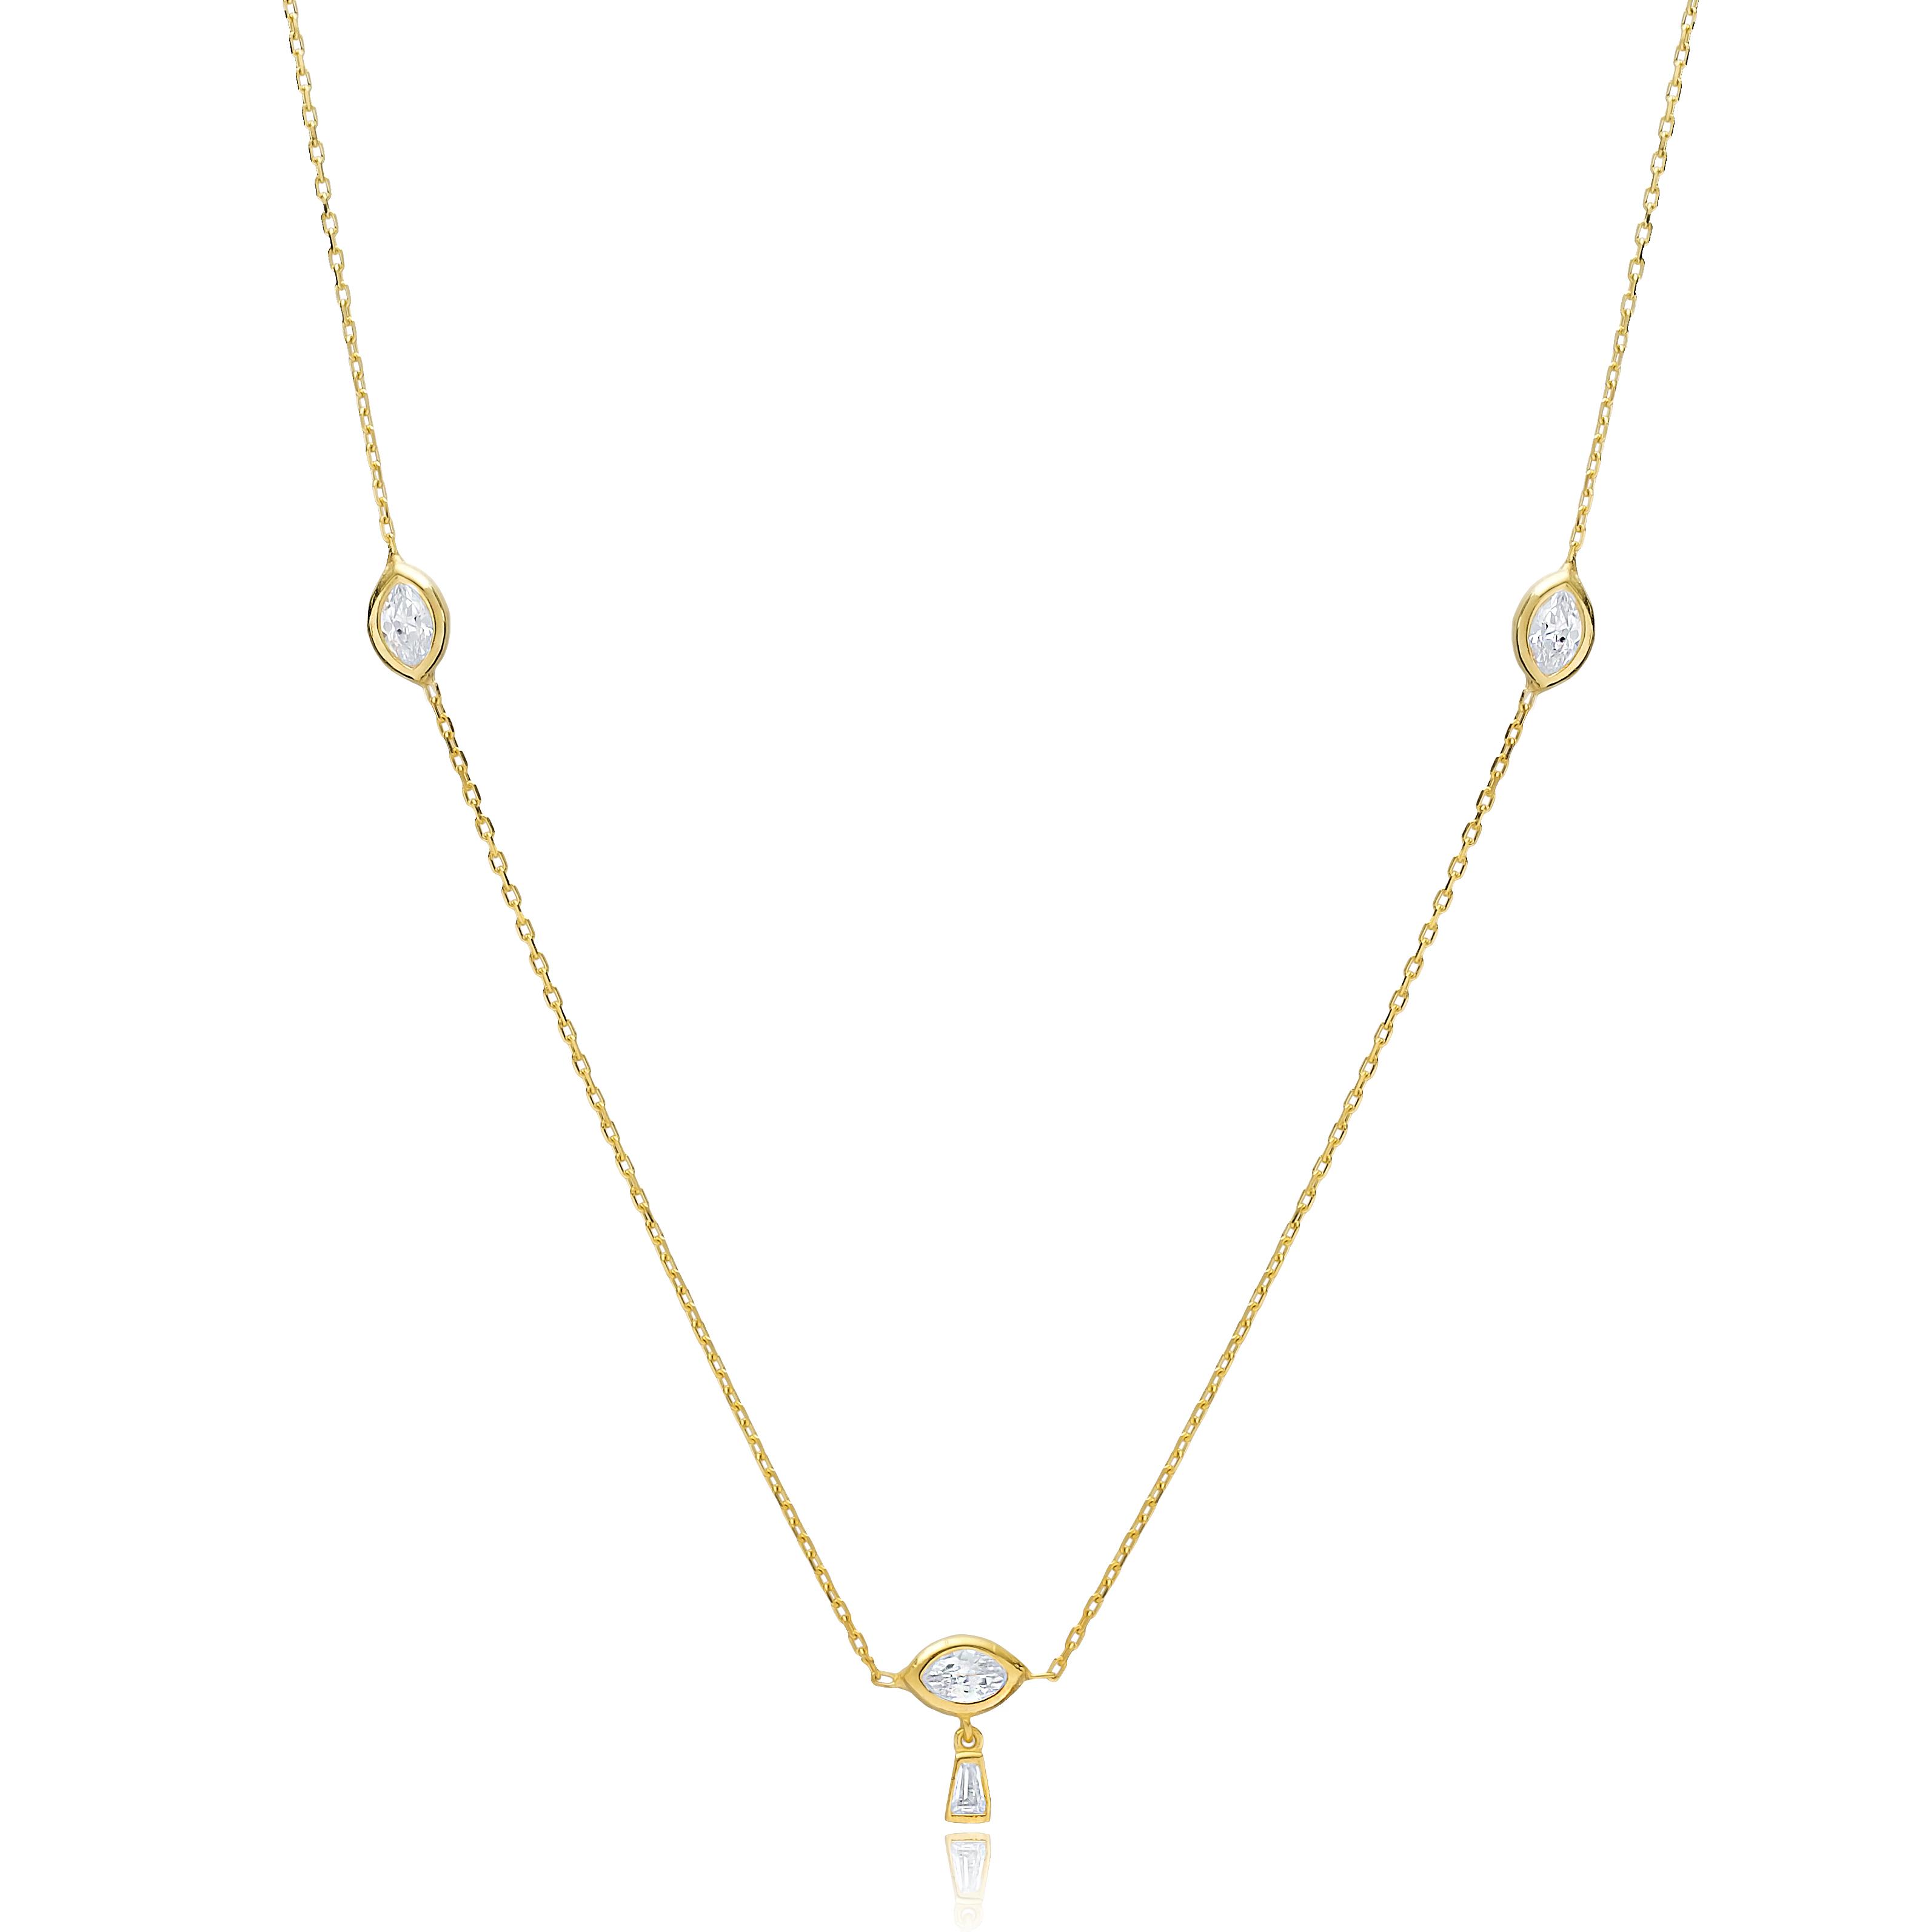 Shaline Necklace